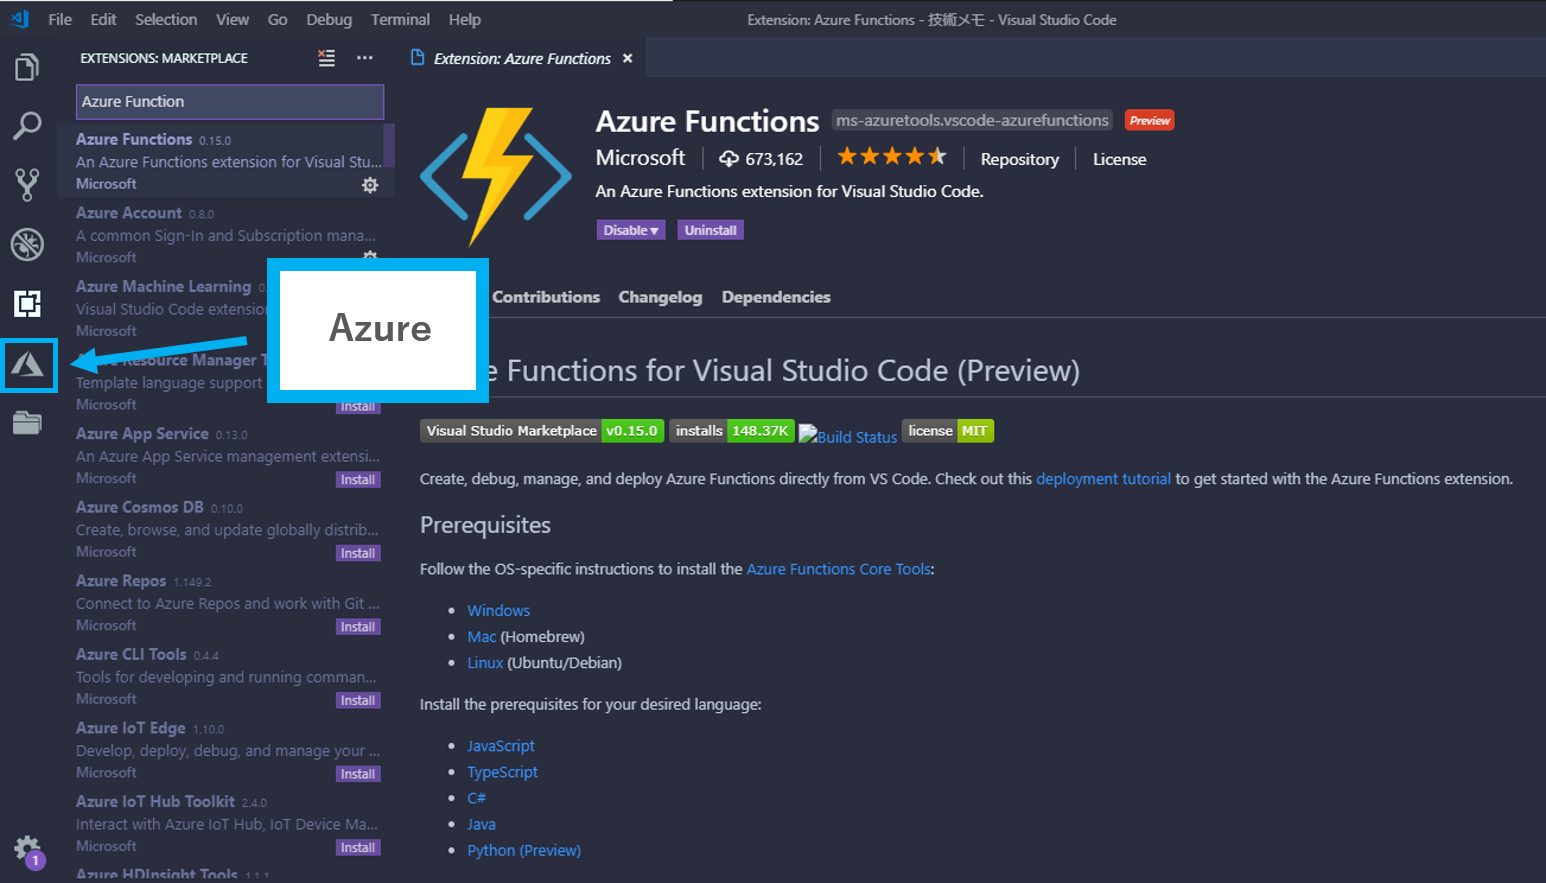 AzureFunctions